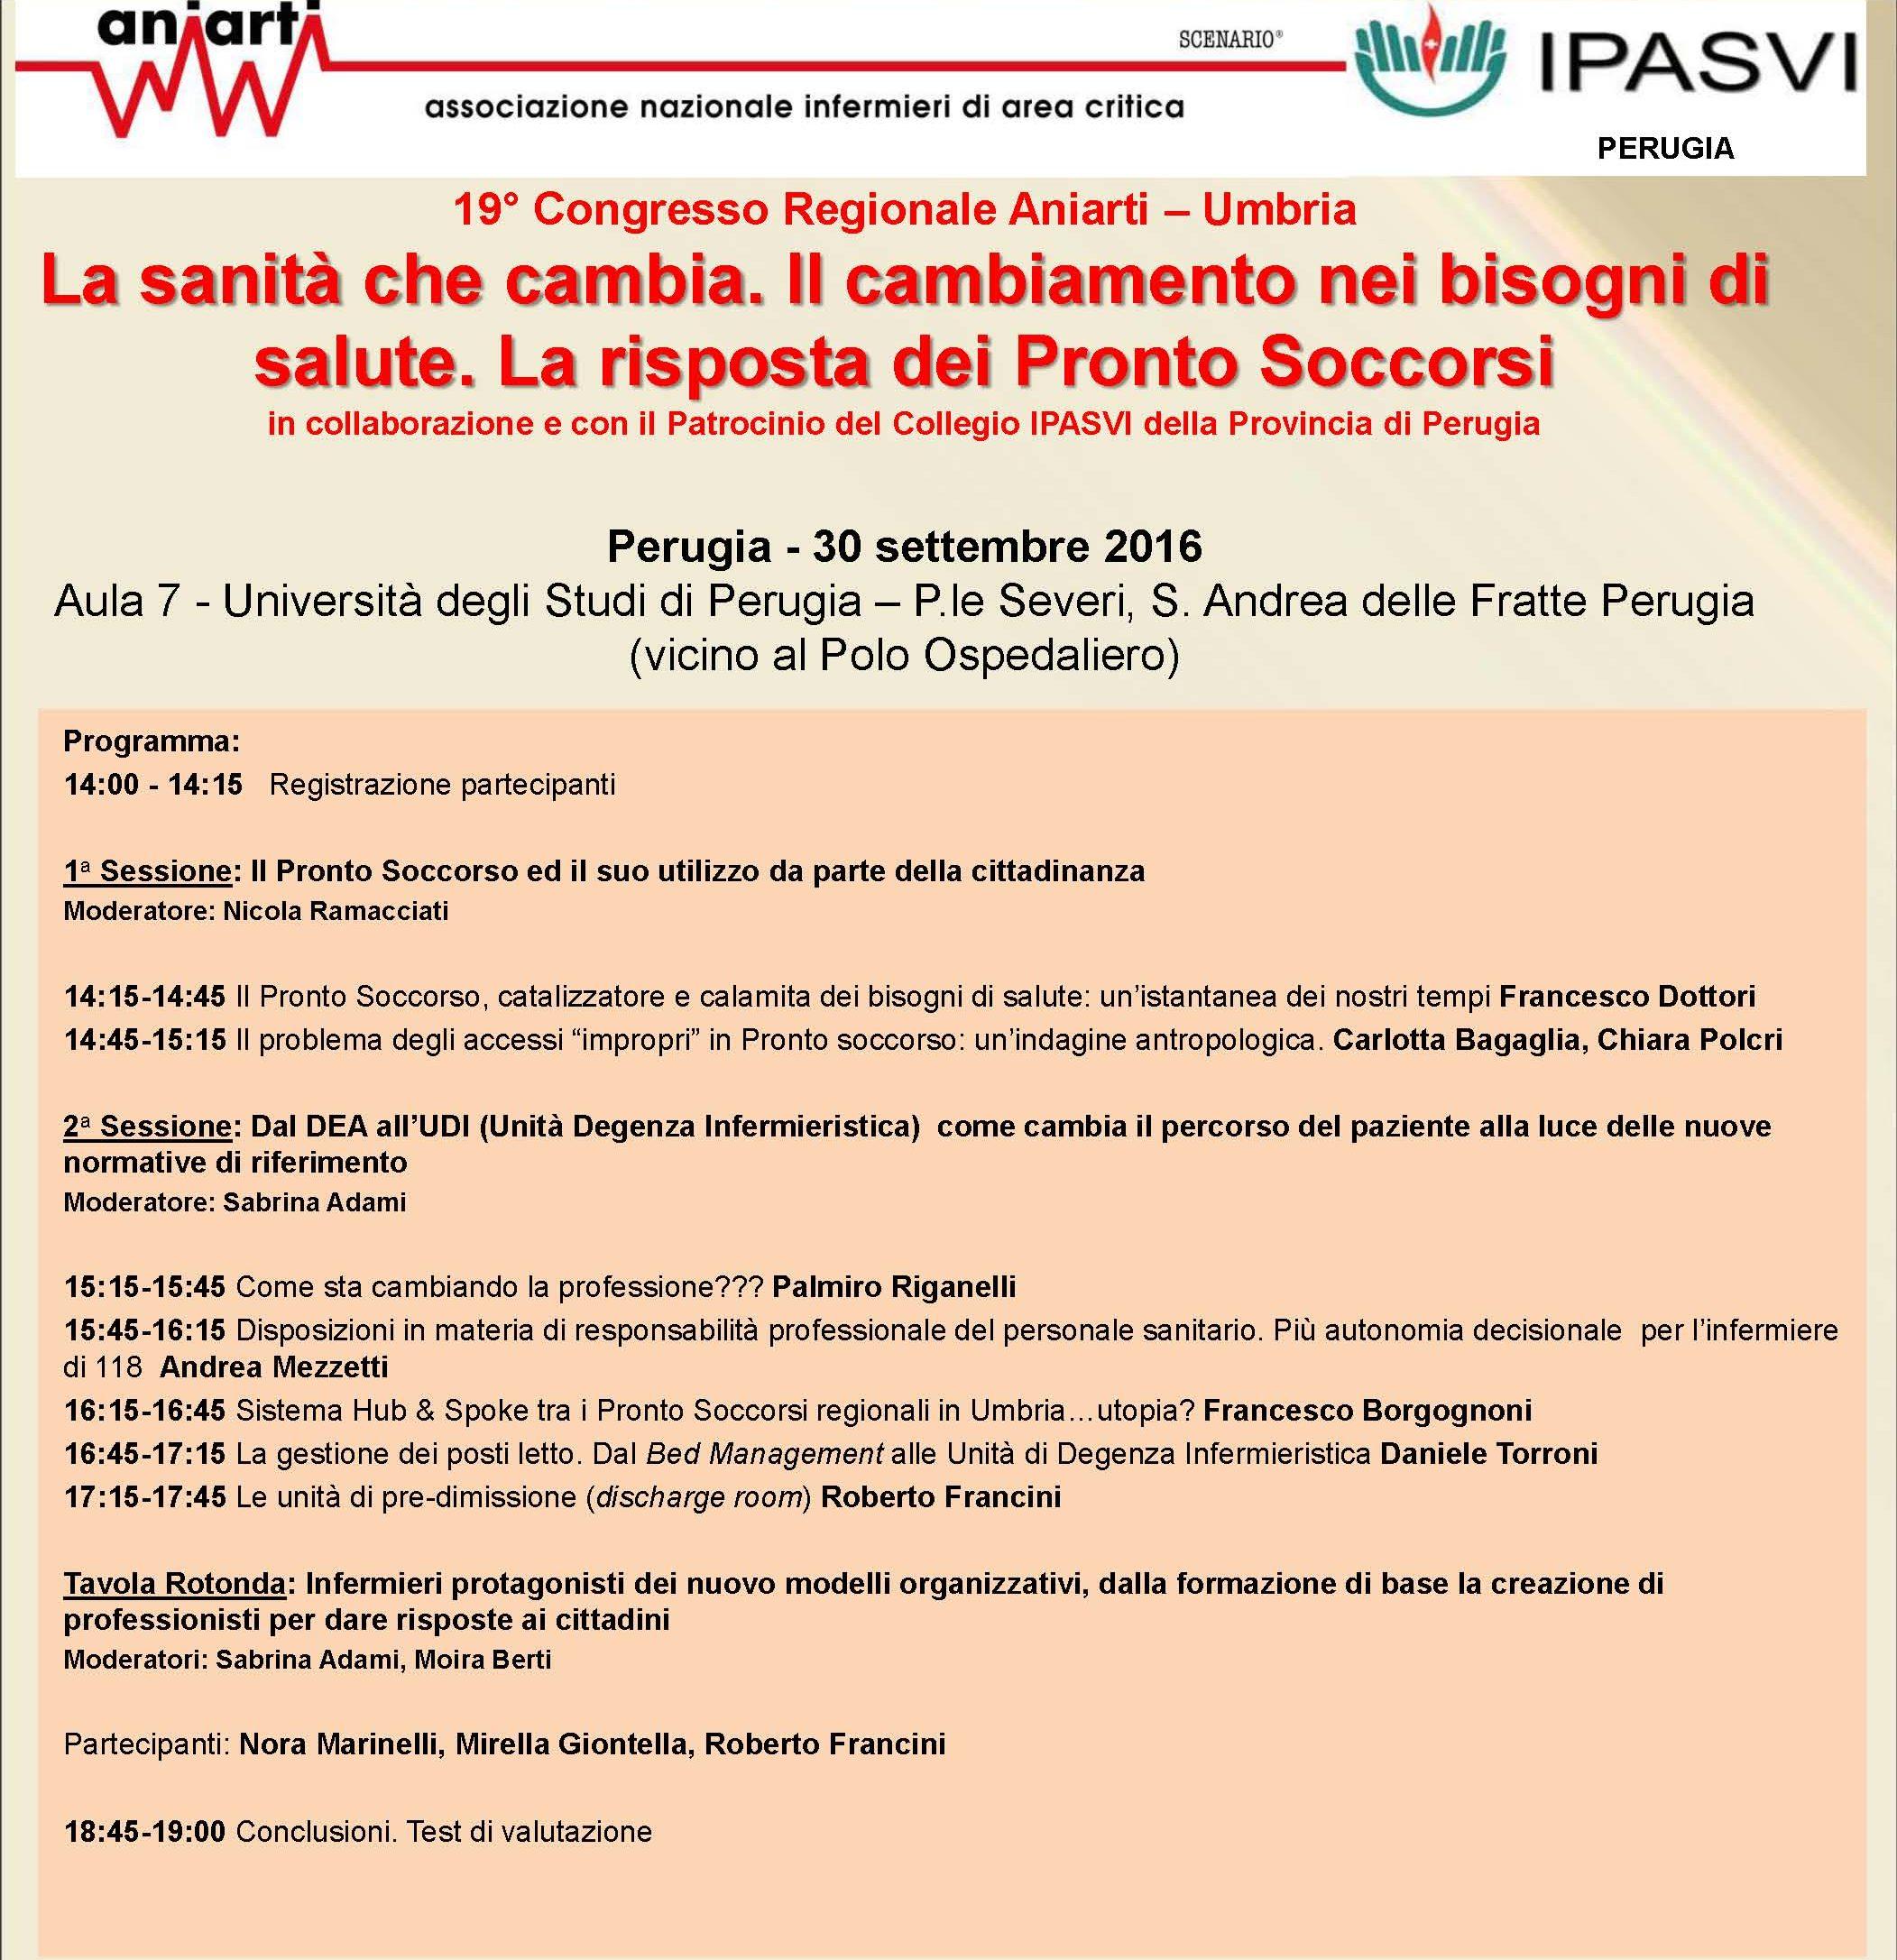 Locandina Convegno Aniarti Umbria2016-3